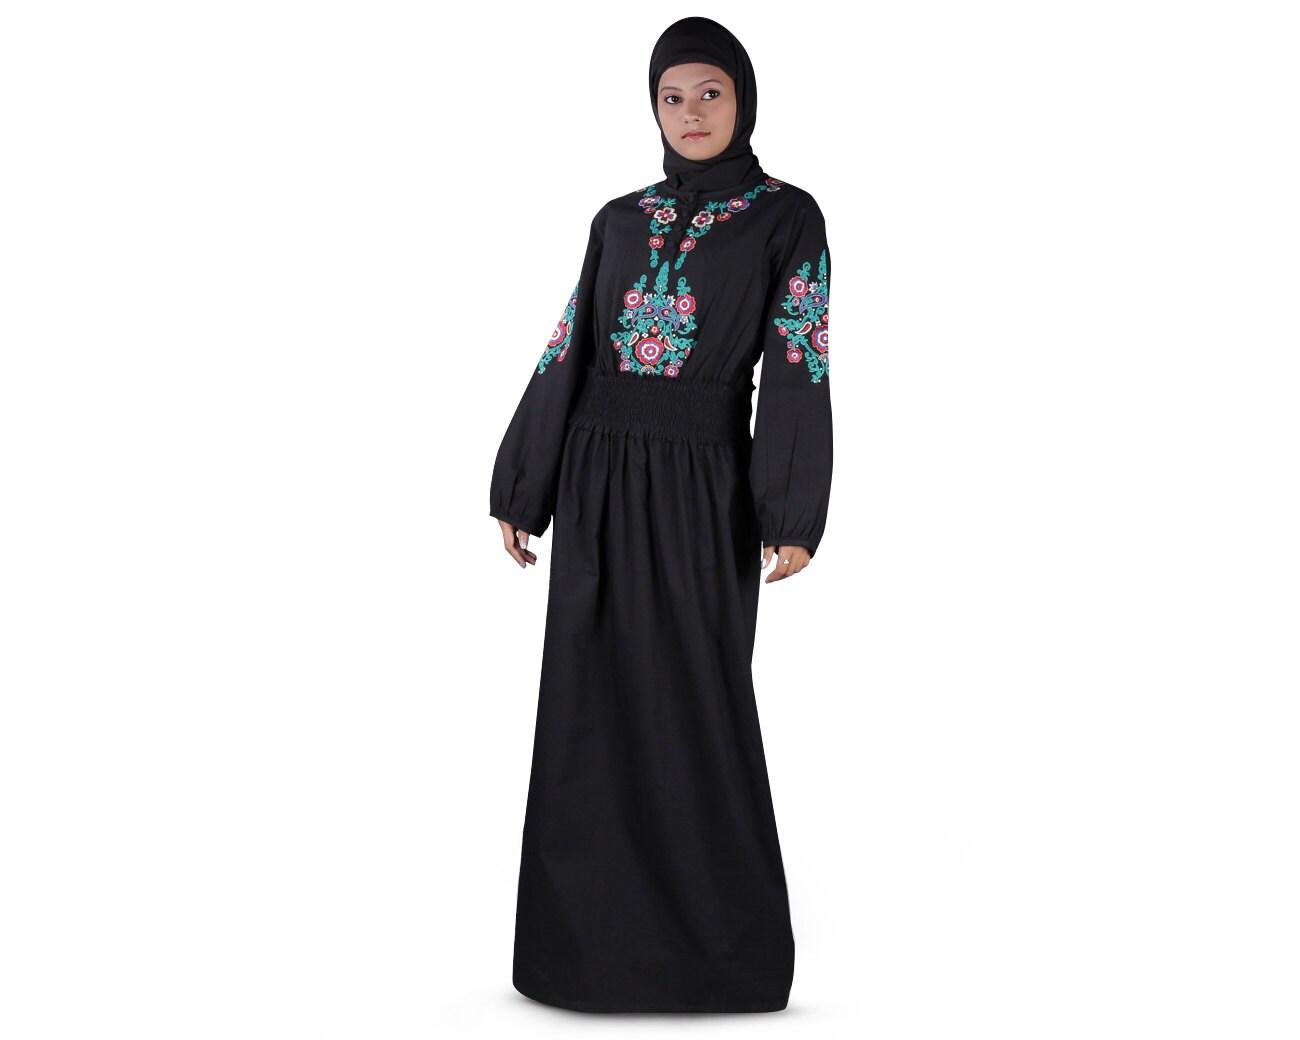 Black cotton dress - Etsy